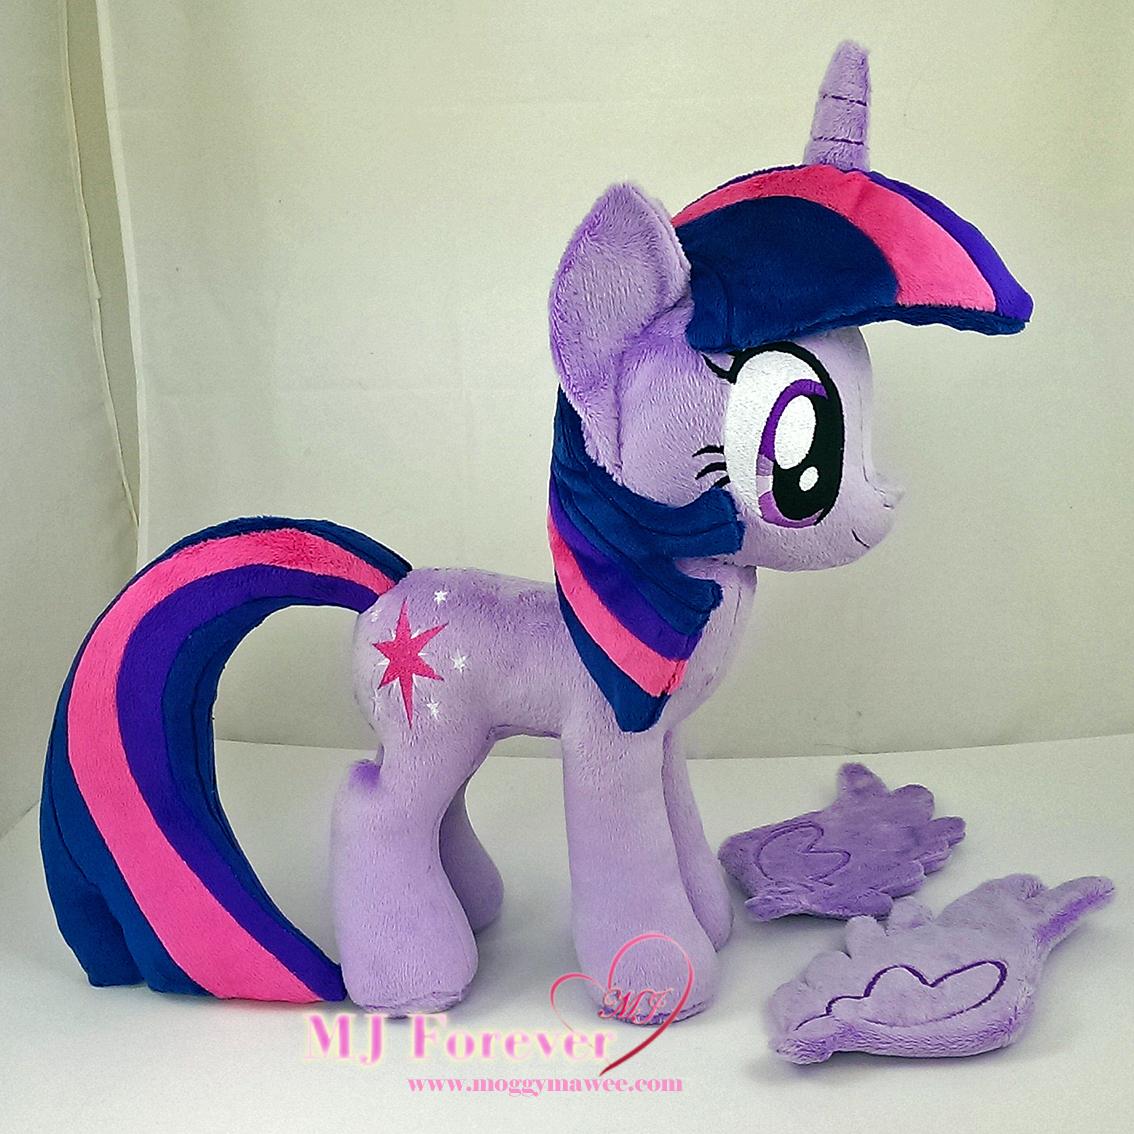 Twilight Sparkle plushie sewn by meeee!!!!!